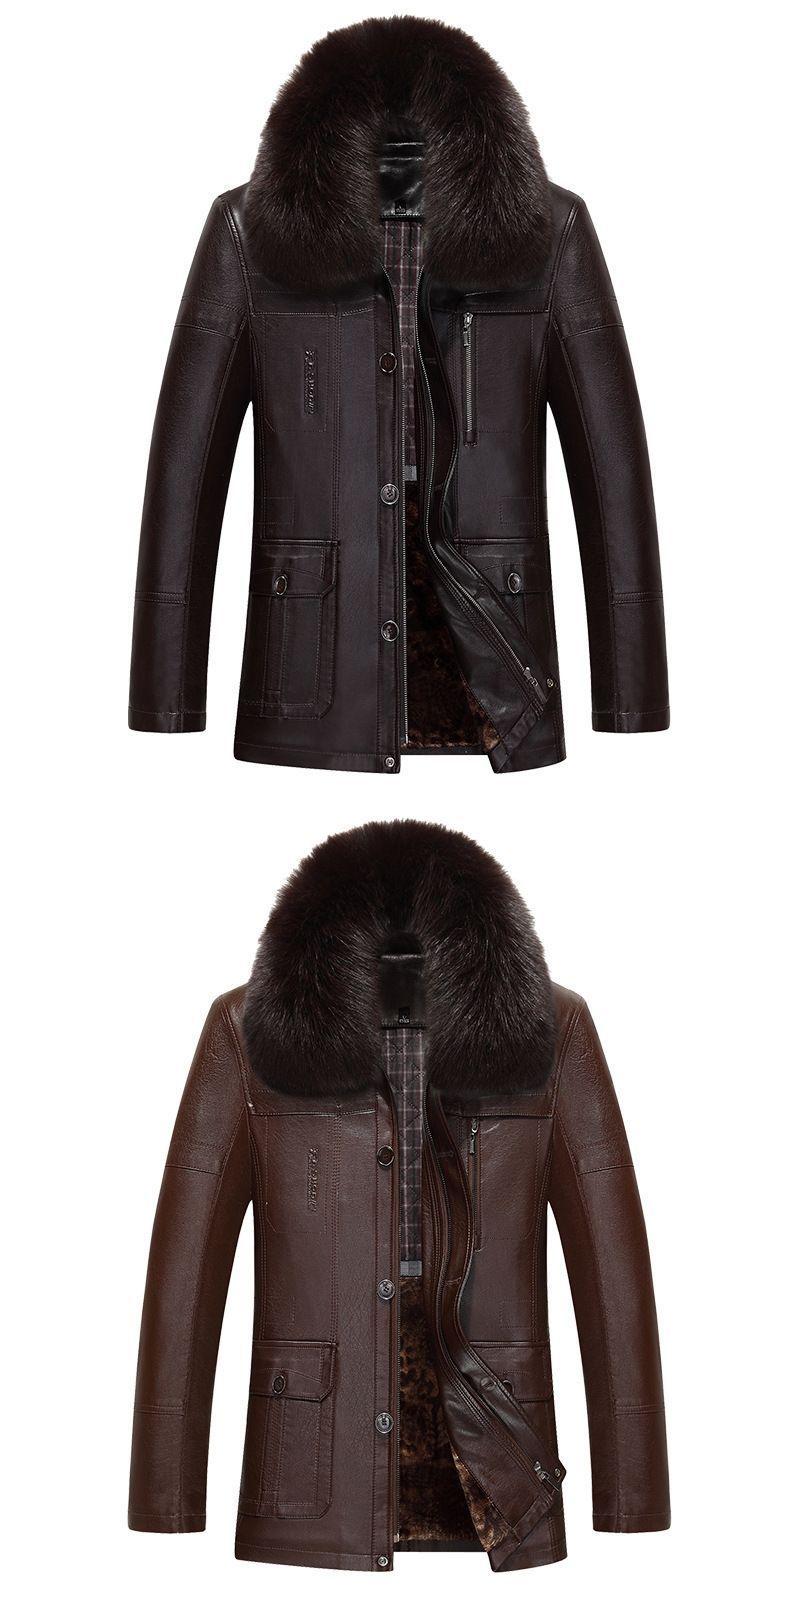 Man Winter Fur Coat middleaged men's leather jacket